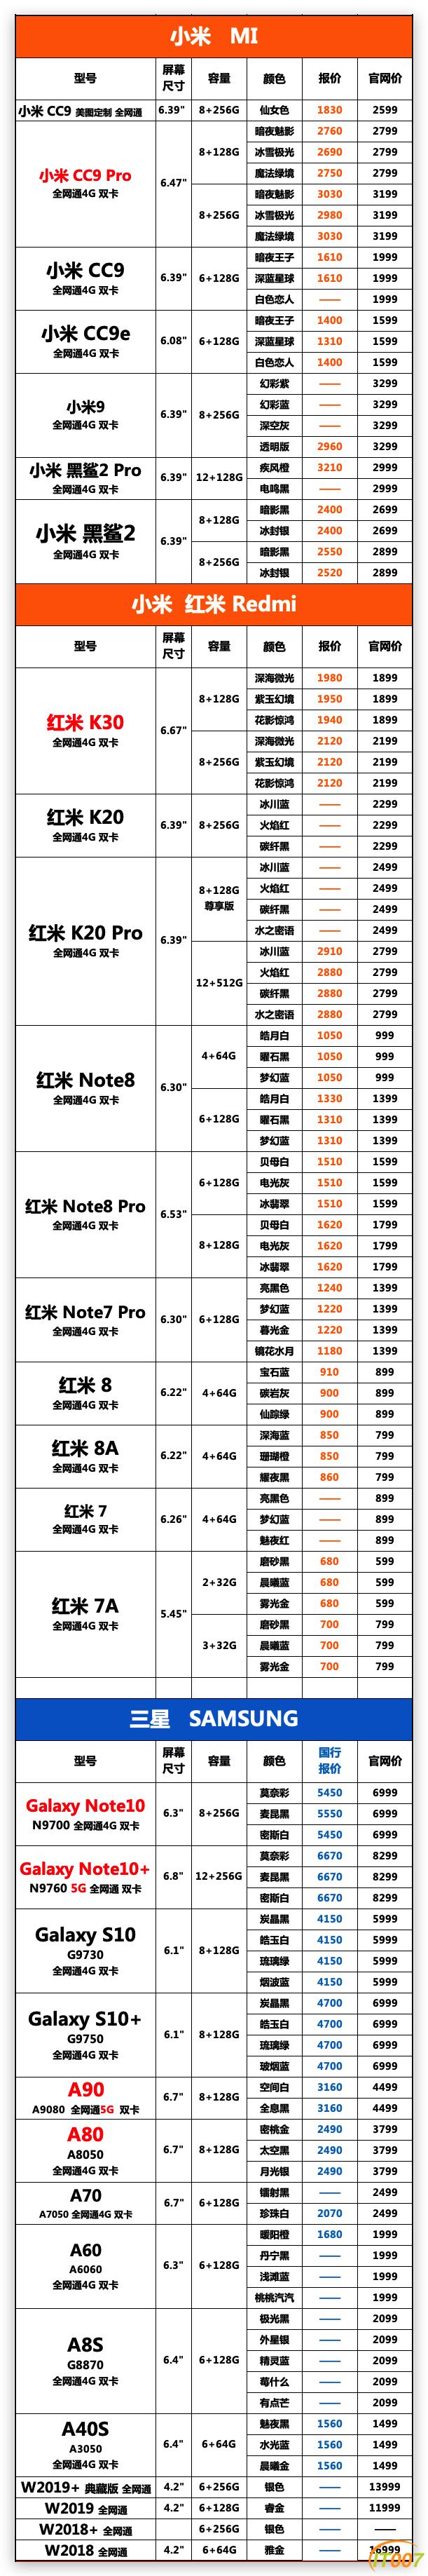 Xnip2020-01-18_10-55-20.png